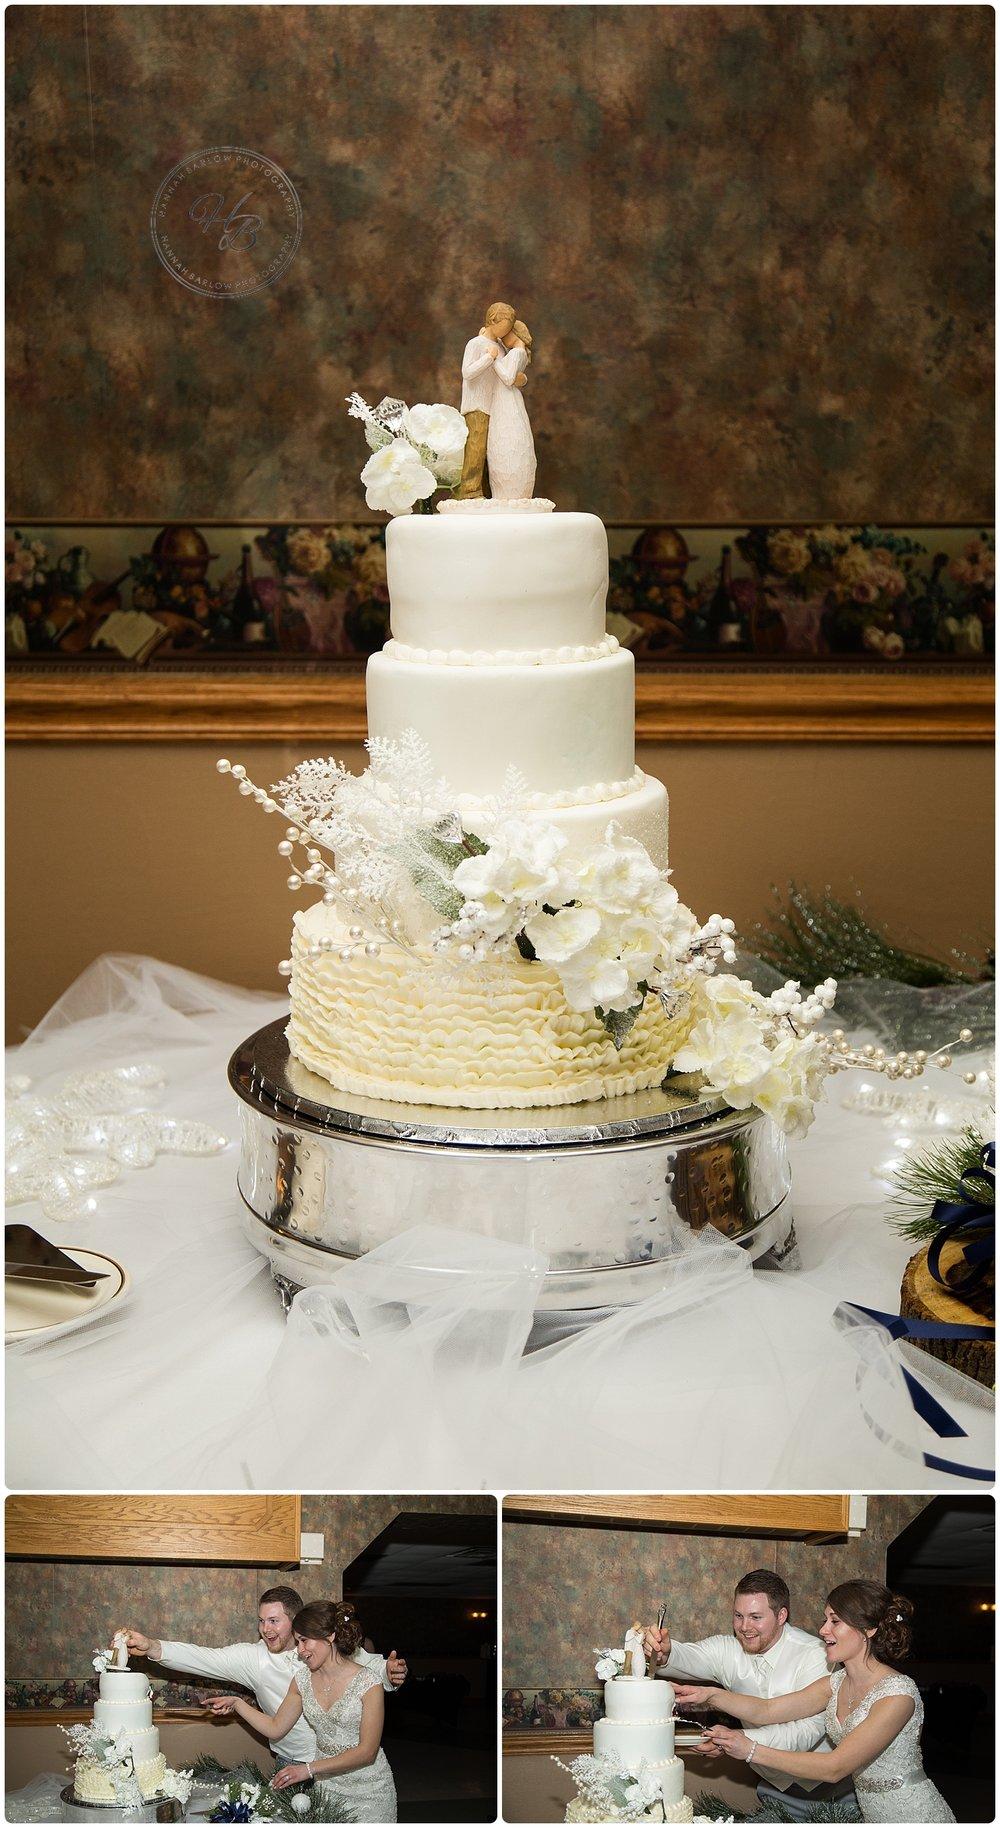 Wedding Reception Cake Photo St. Florian Follansbee WV